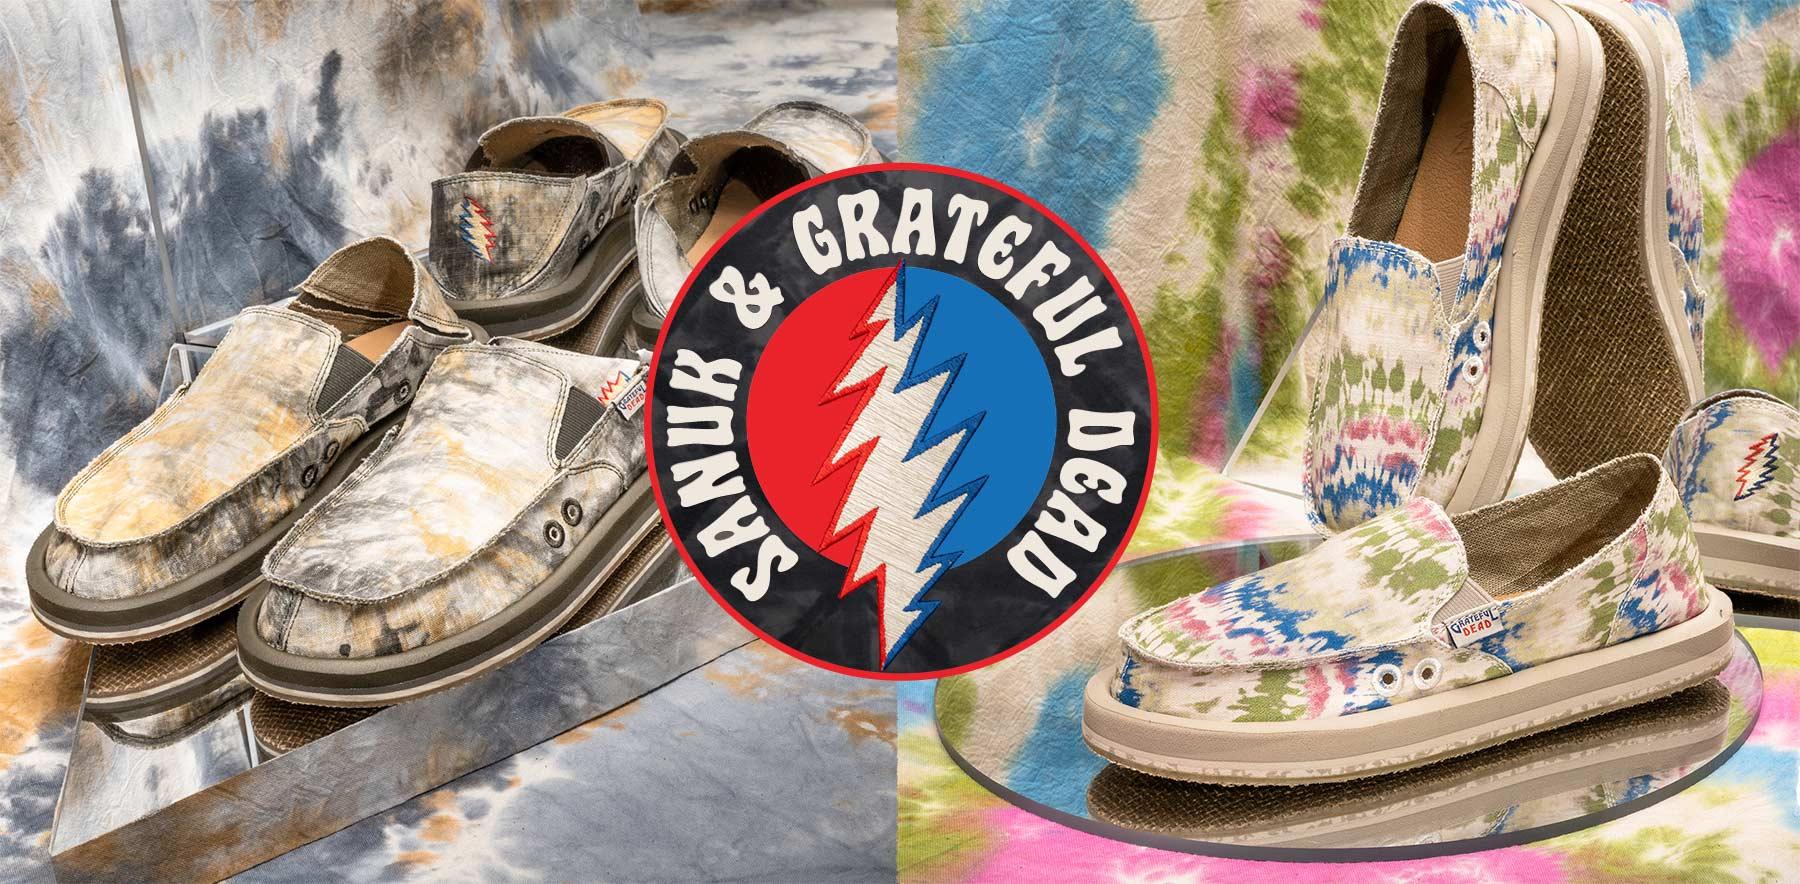 2021 Lifestyle Apparel Collection | Sanuk X Grateful Dead Collaboration